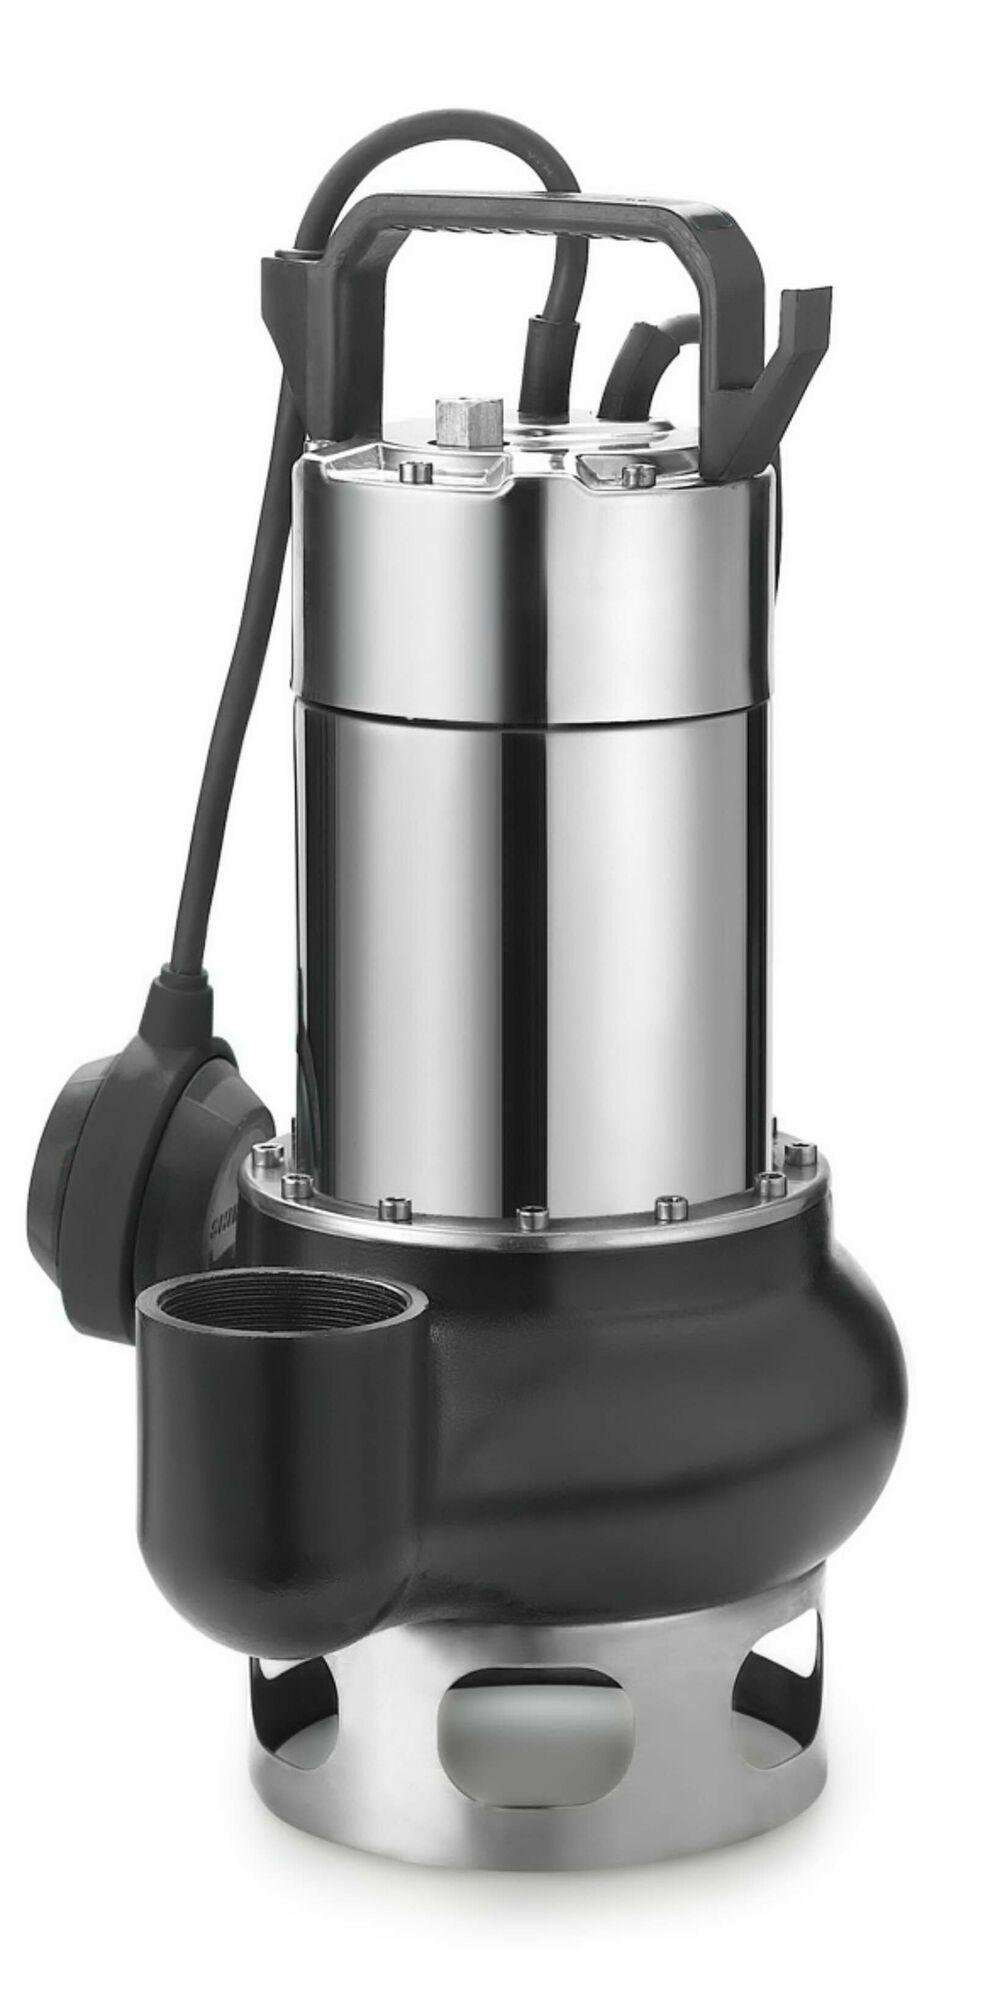 Eurom SPV750i Professionele vuilwaterpomp 750W   Dompelpomp